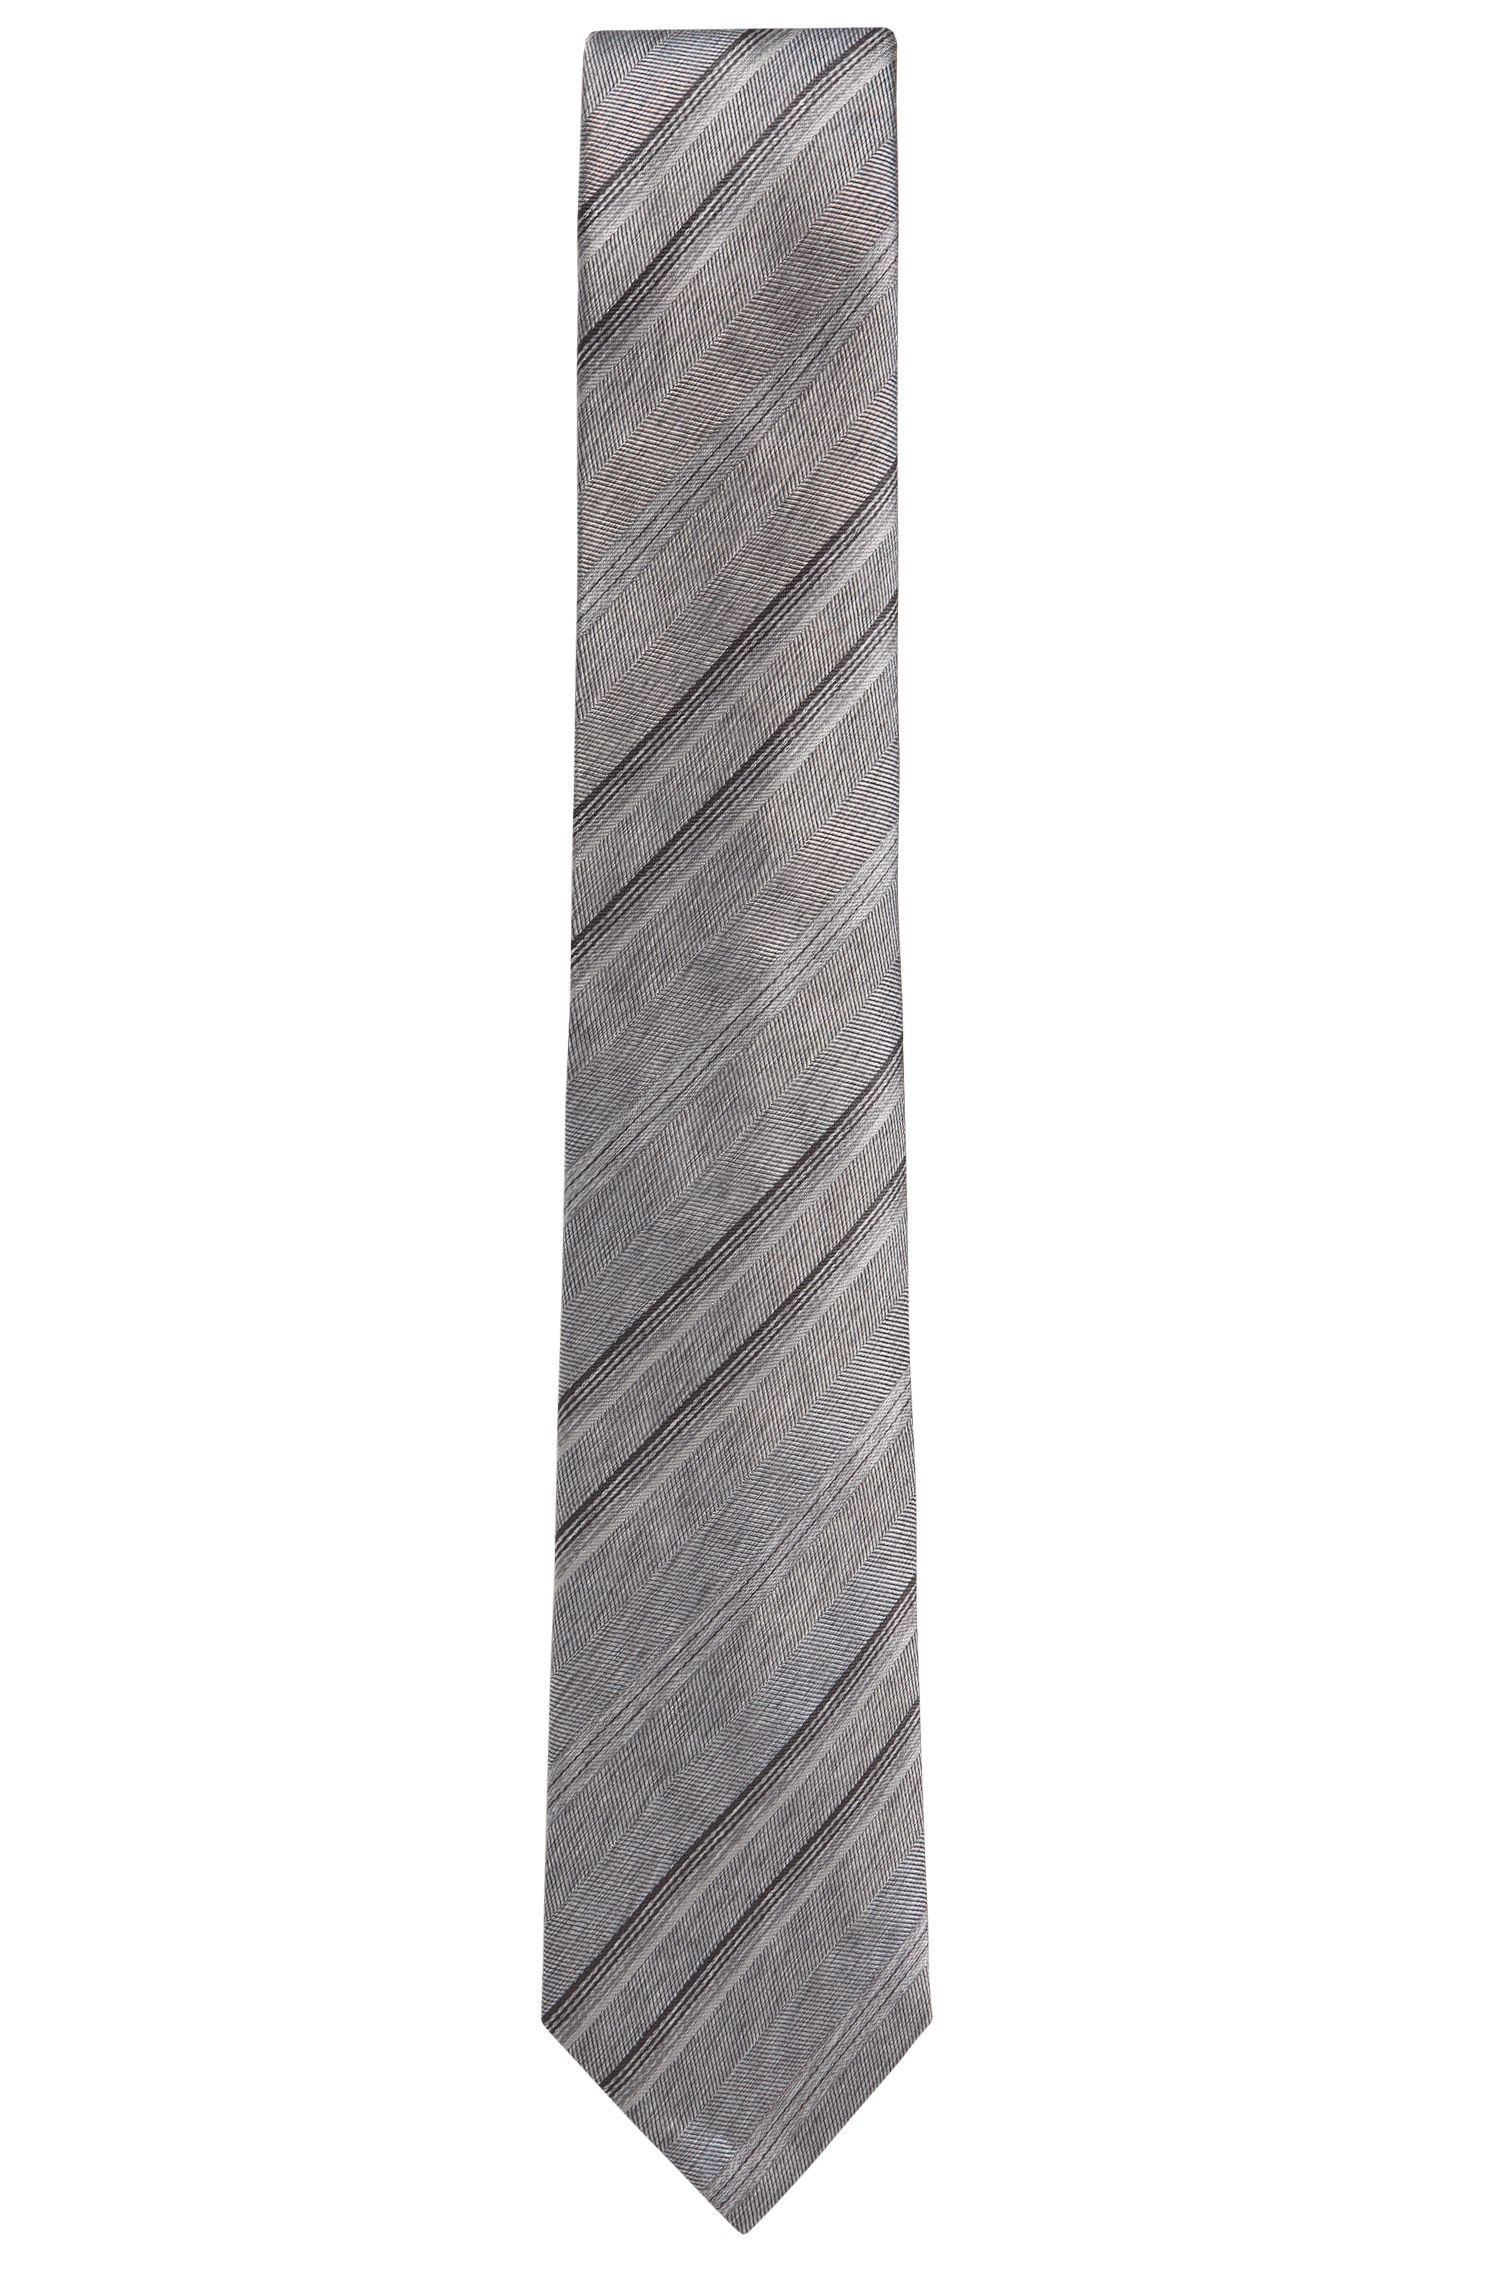 'T-Tie 7.5 cm' | Regular, Striped Herringbone Italian Silk Tie